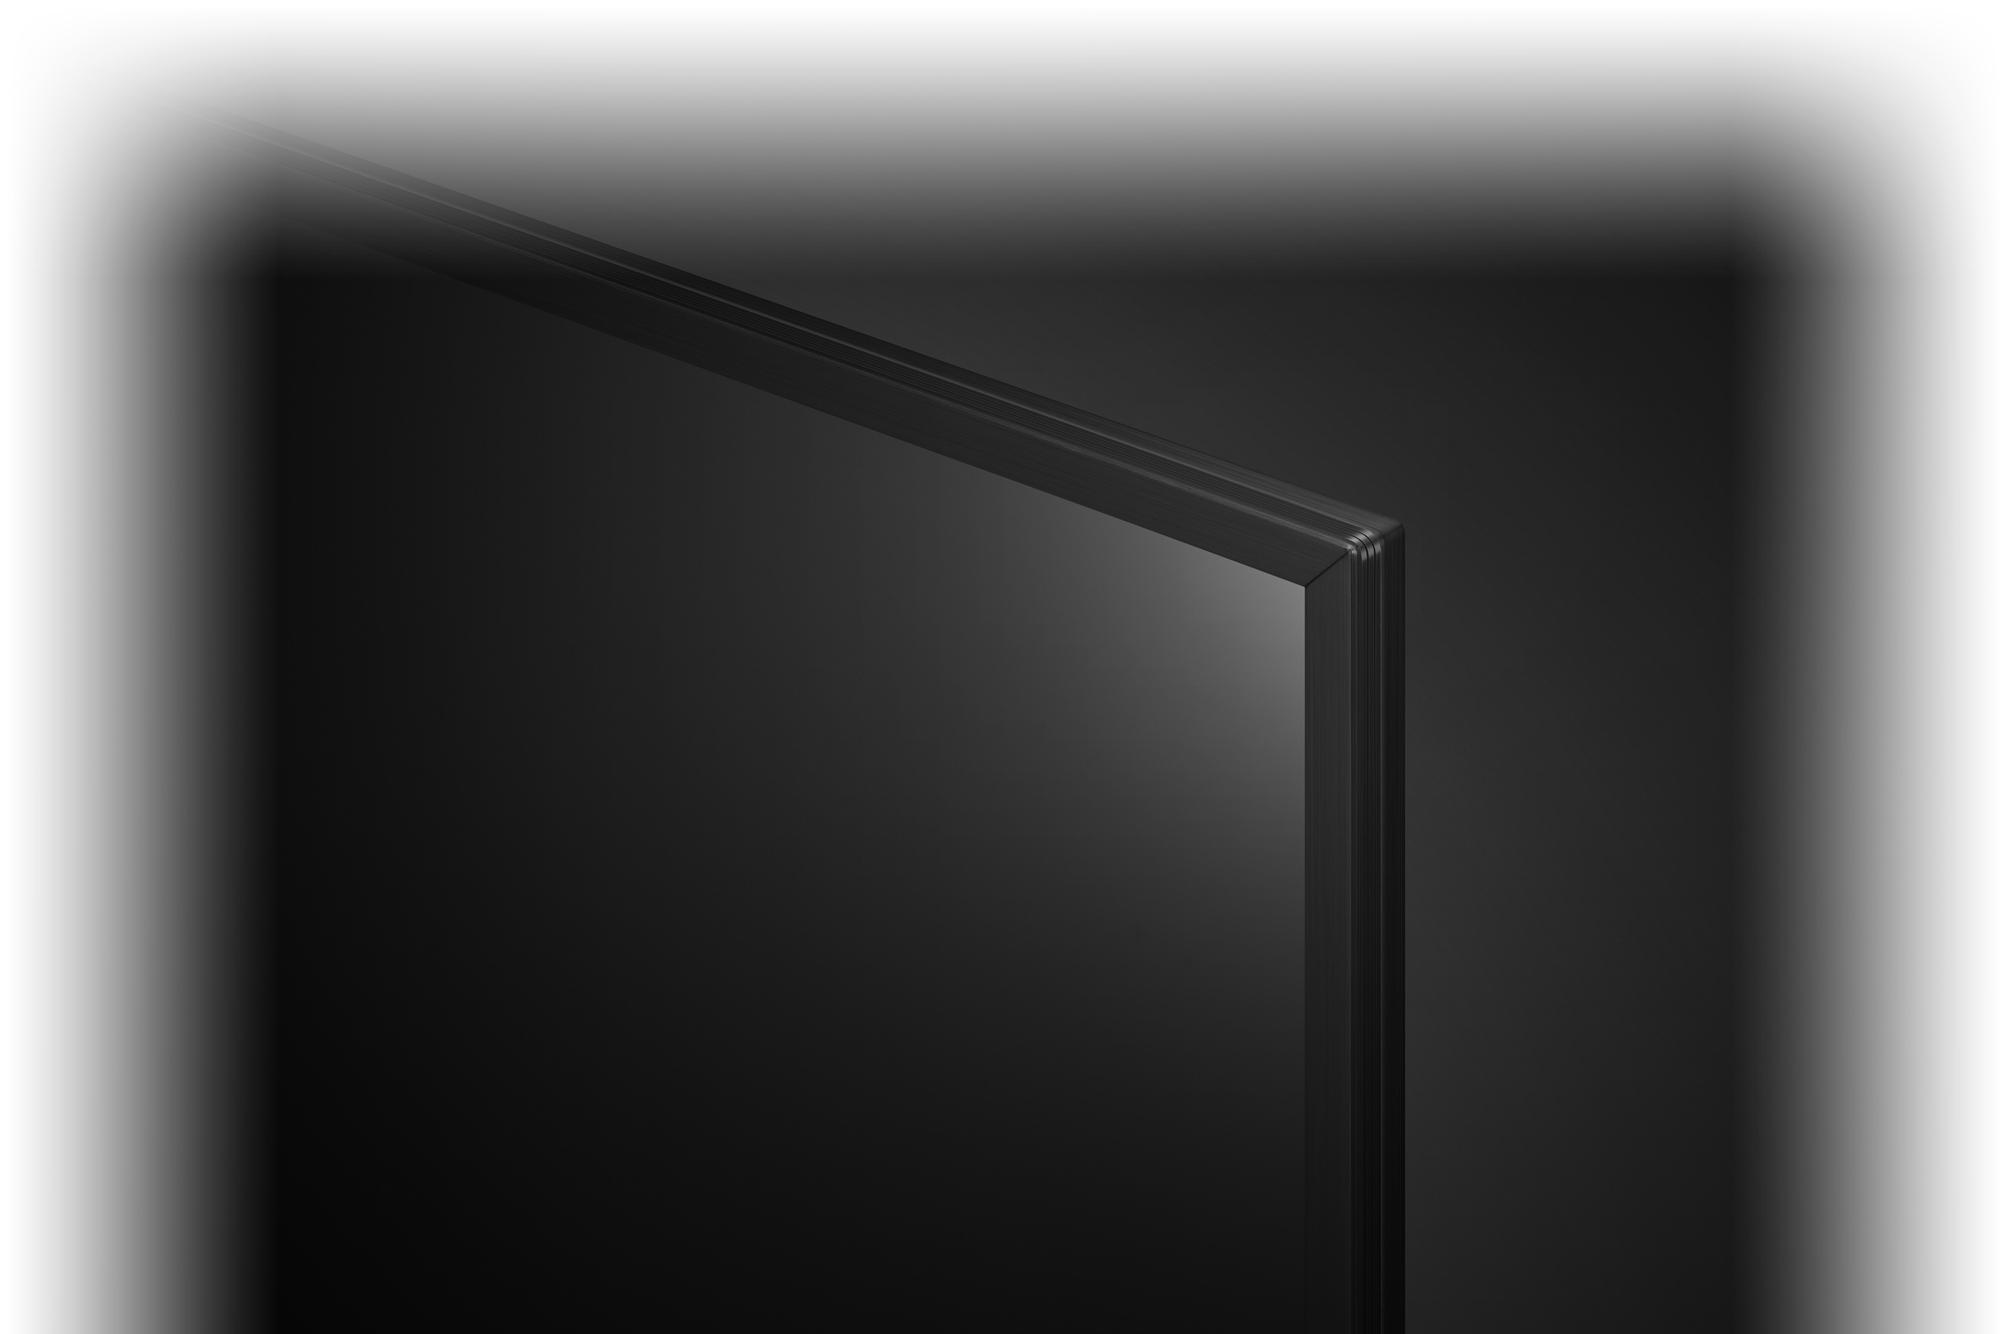 LG Pro:Centric SMART 75UT770H (NA) 11